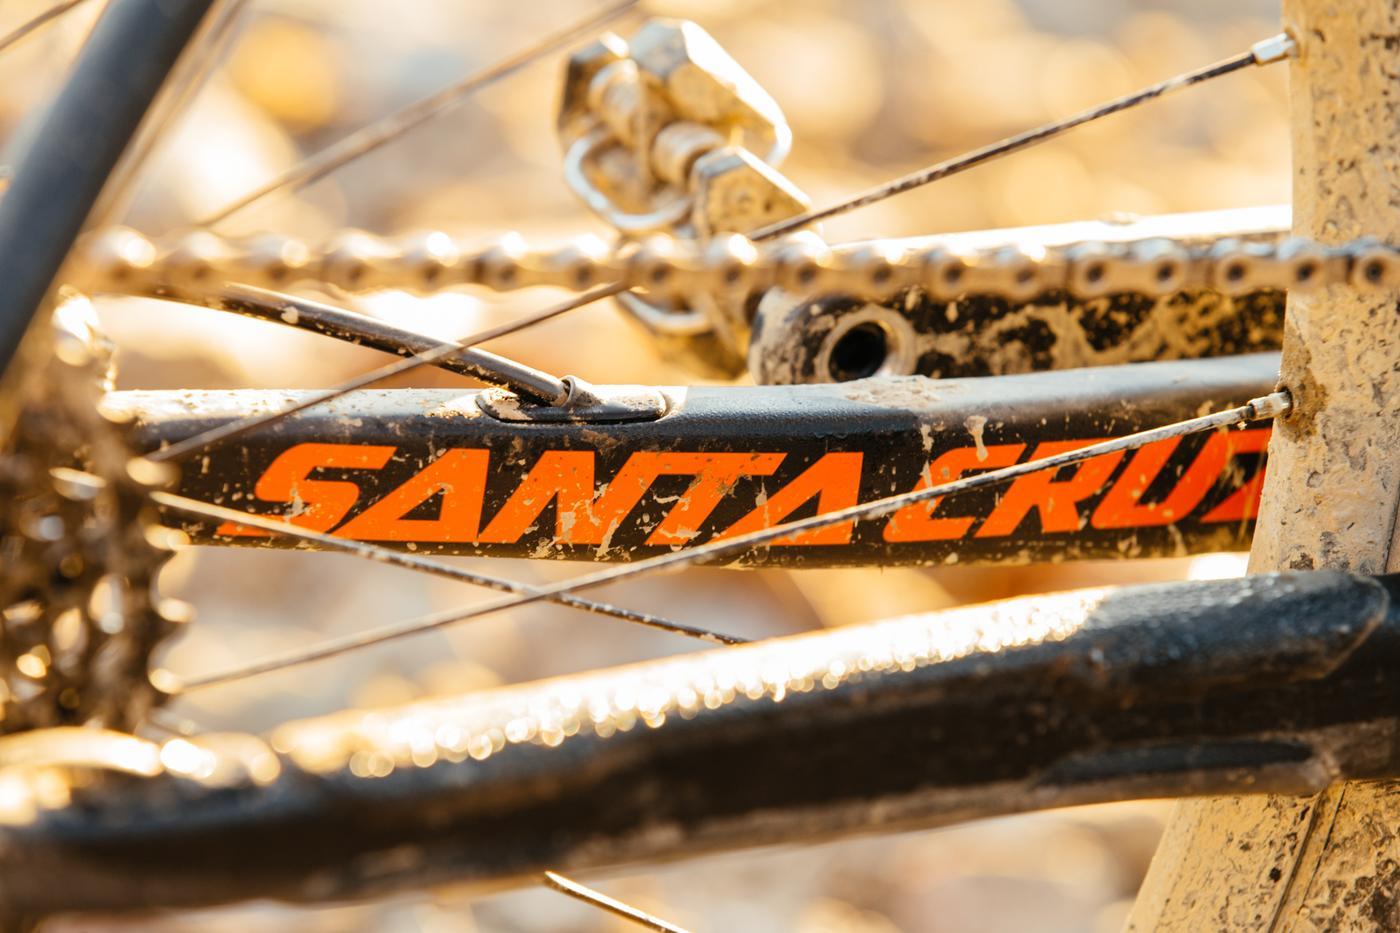 Santa Cruz Highball 29r Hardtail XC MTB